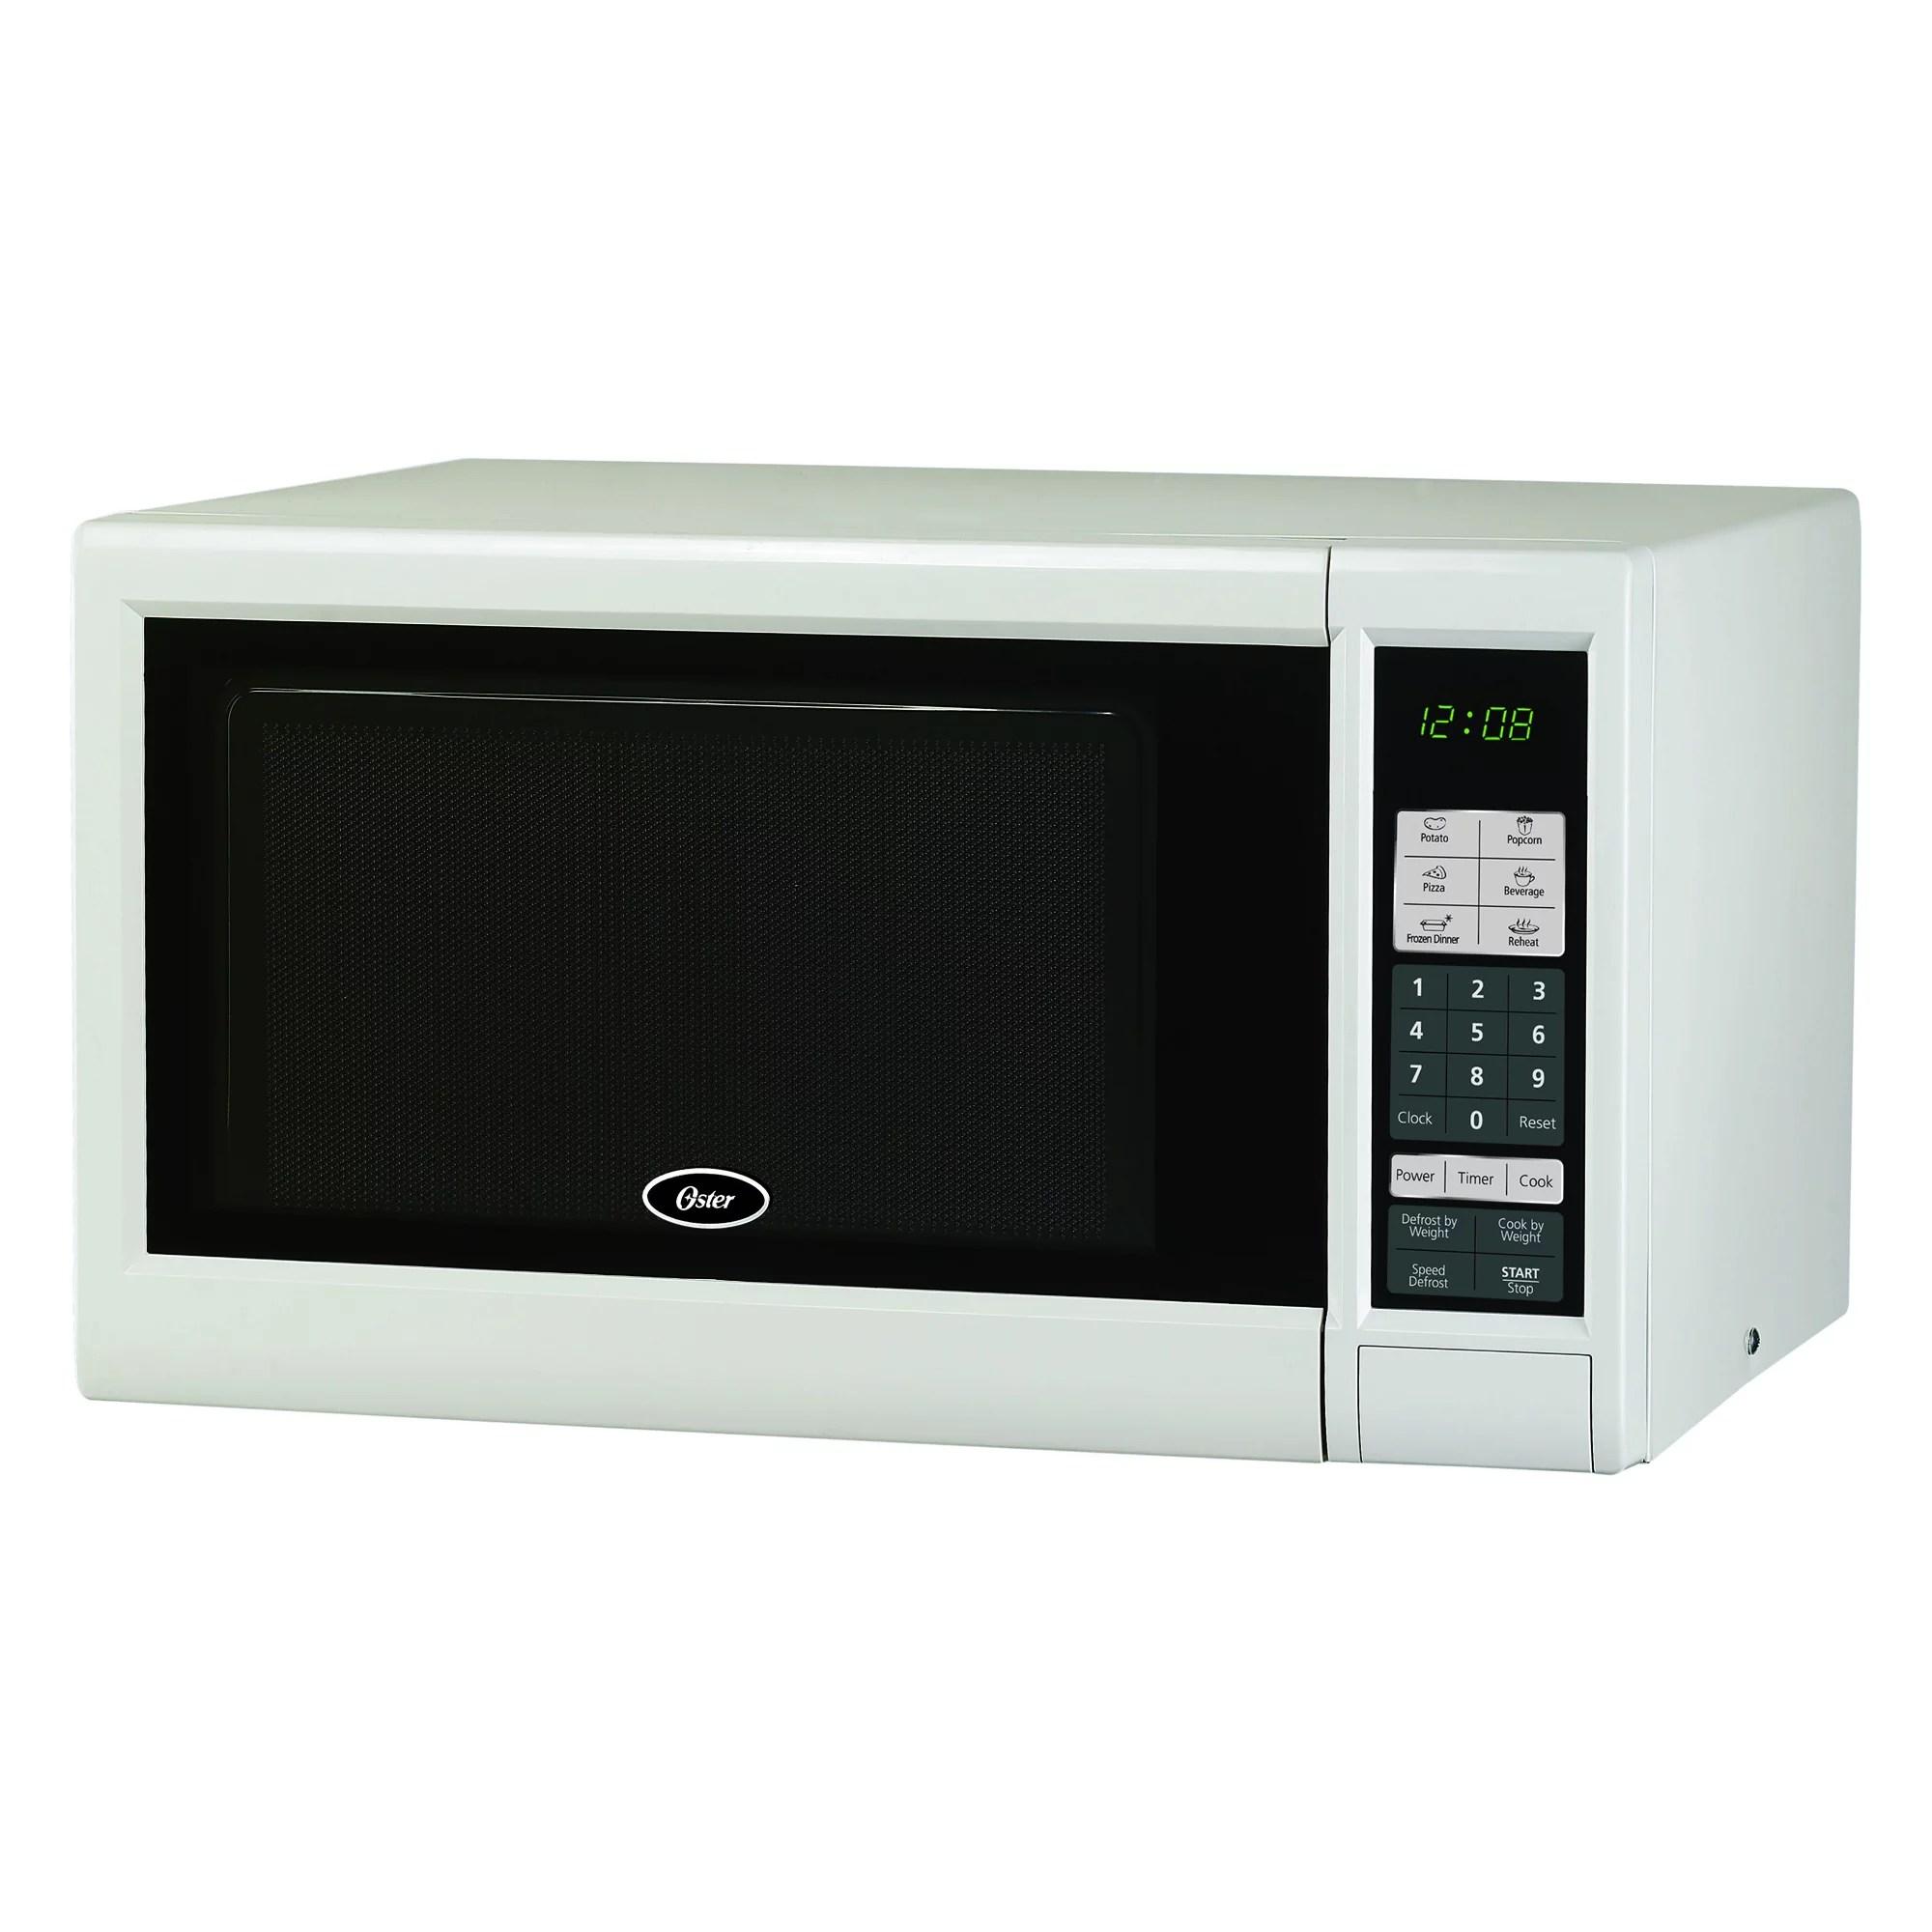 oster ogm41101 1 1 cu ft 1000w digital microwave oven white walmart com